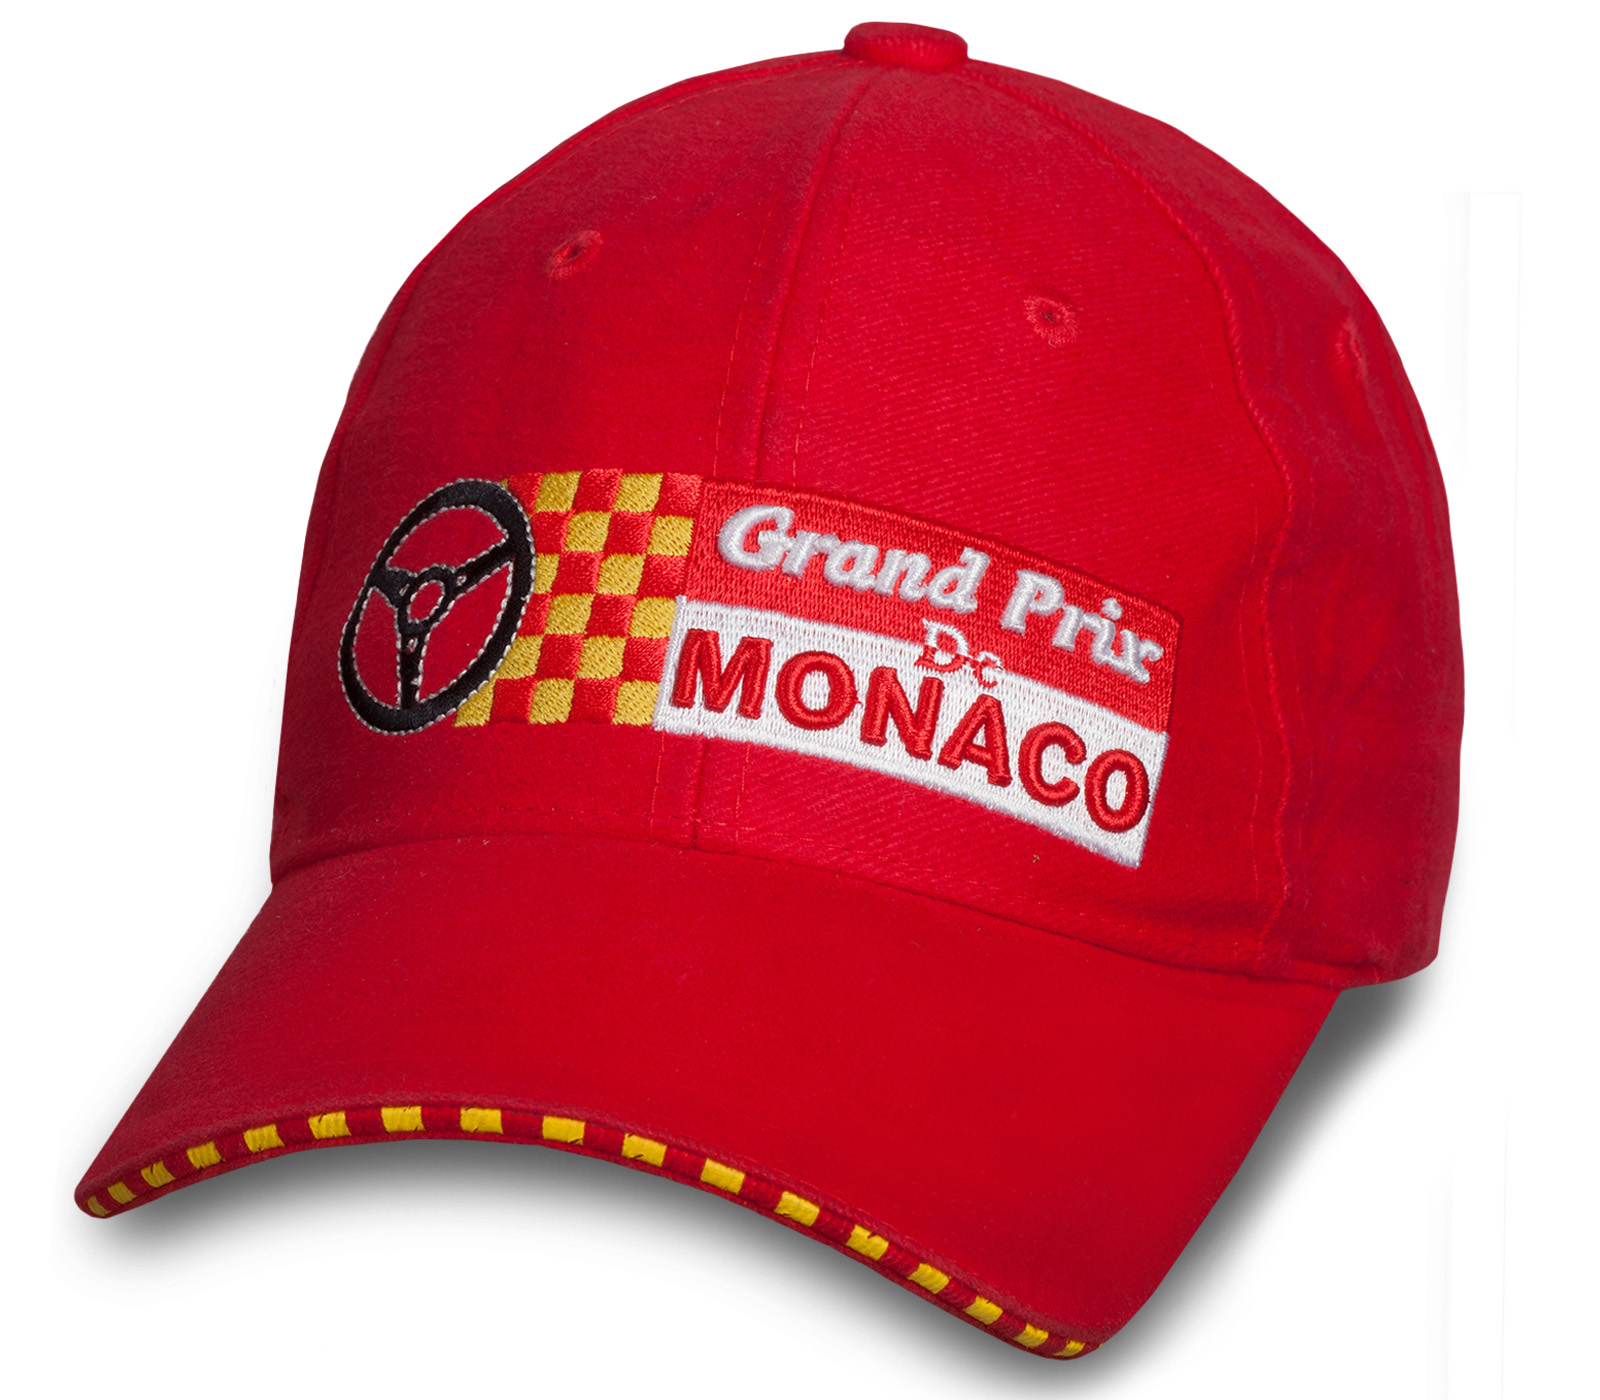 Зачетная красная бейсболка Monaco Grand Prix